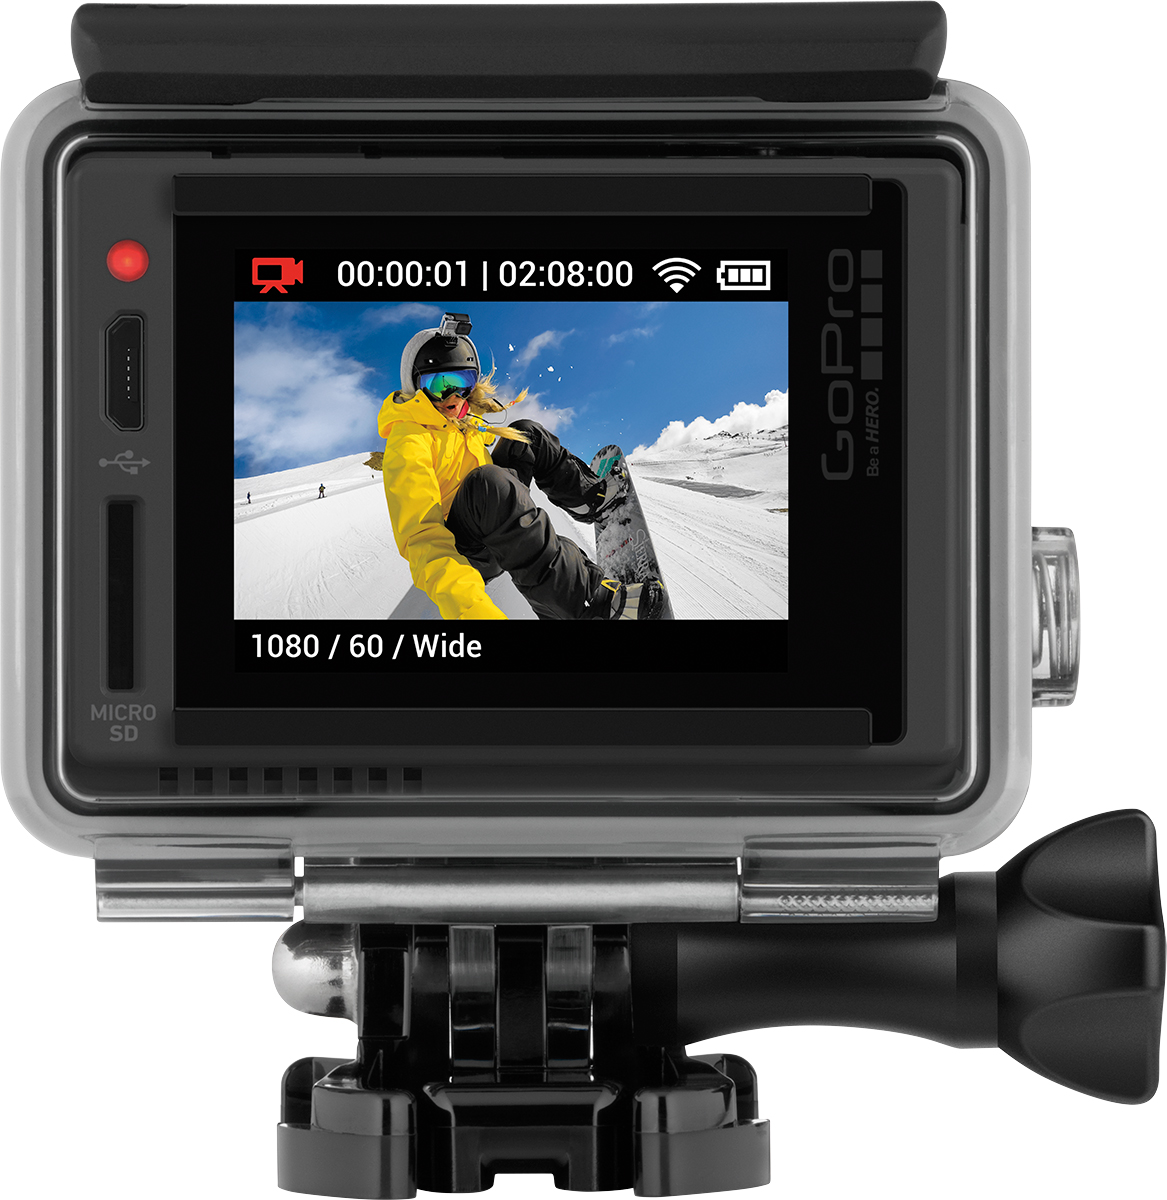 GoPro HERO+ LCD Launch at Best Buy! #ad #GoProatBestBuy